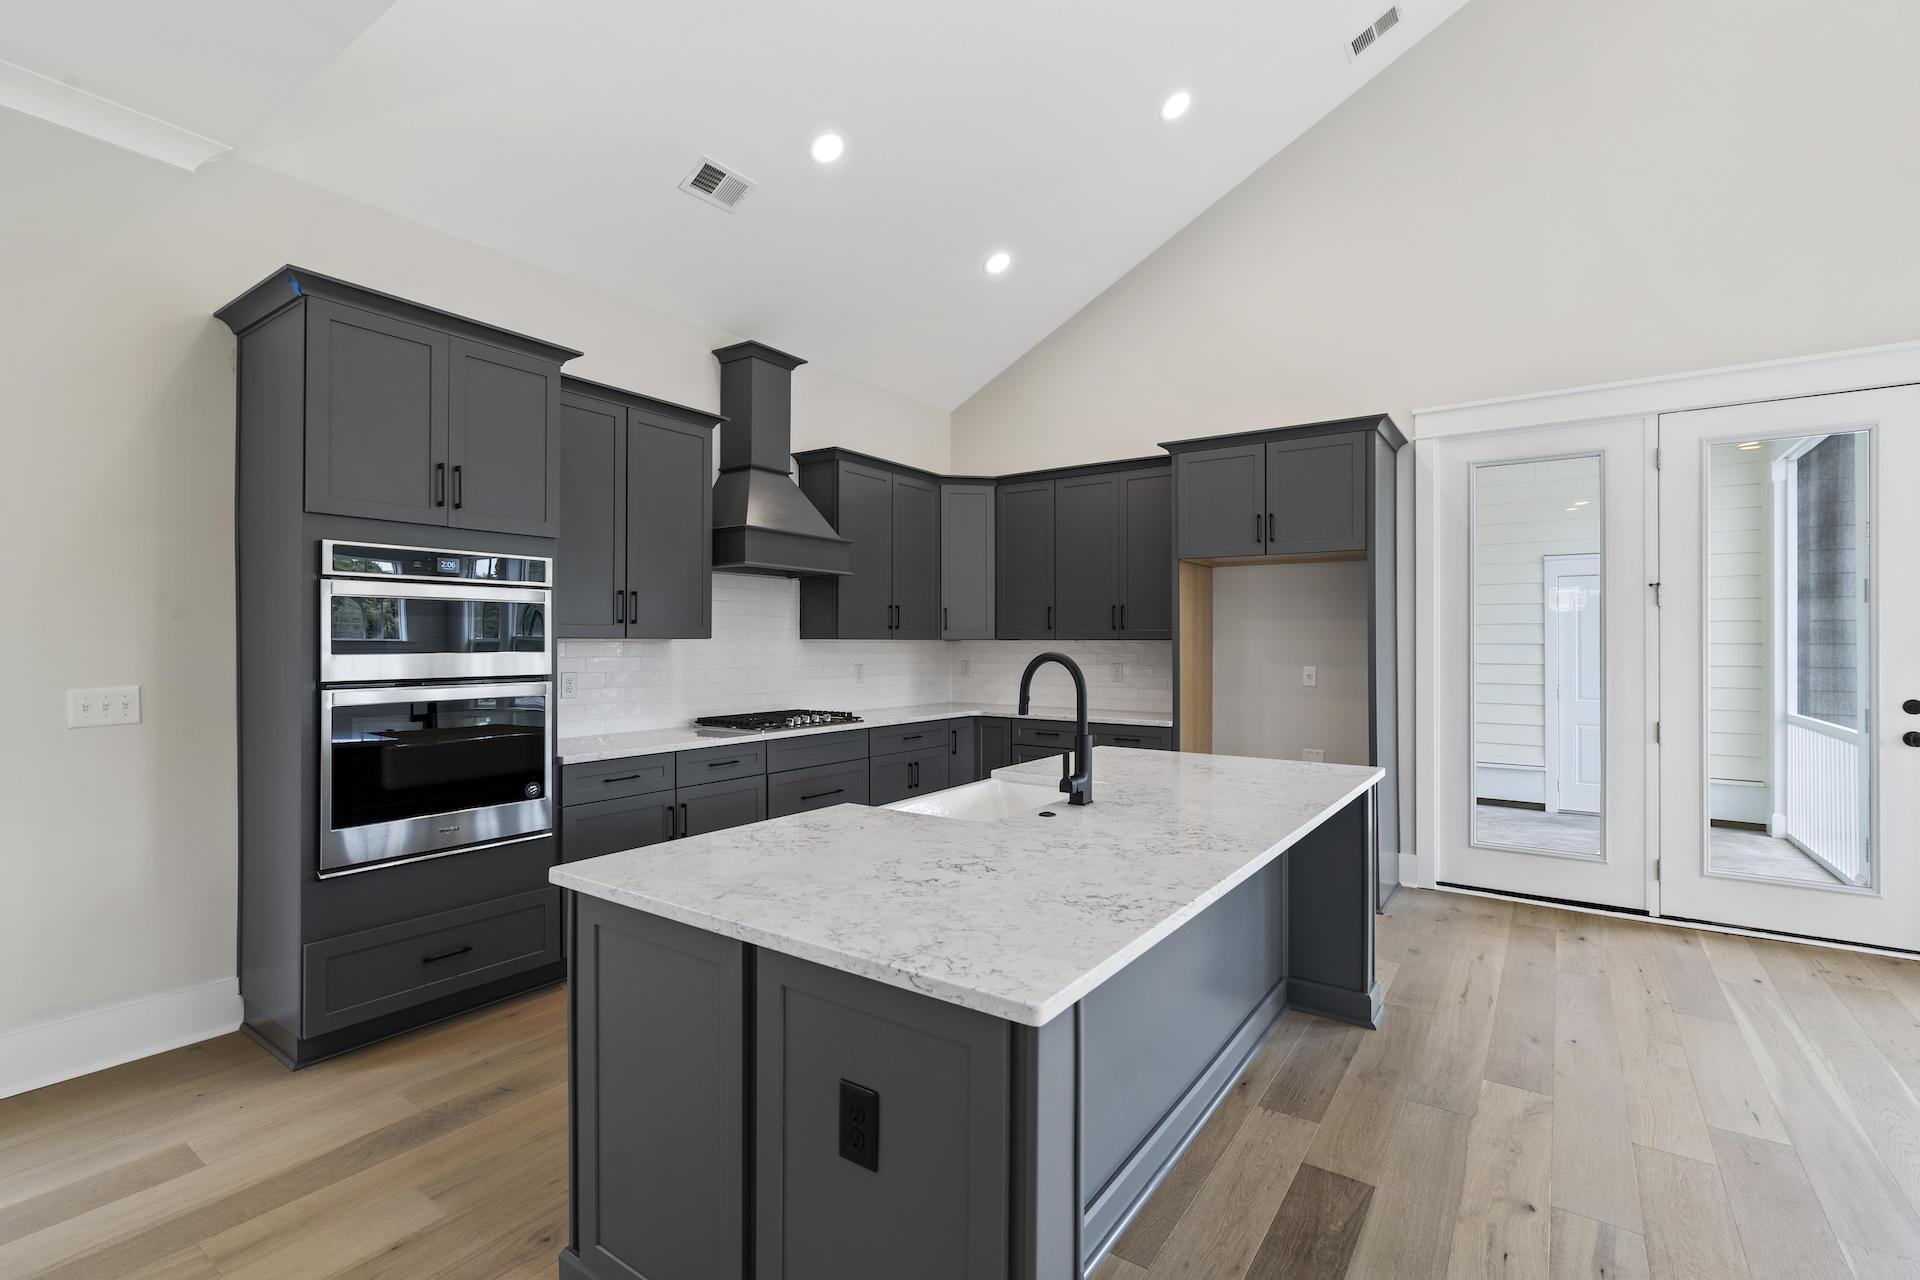 Midtown Homes For Sale - 1320 Upper Union, Mount Pleasant, SC - 26